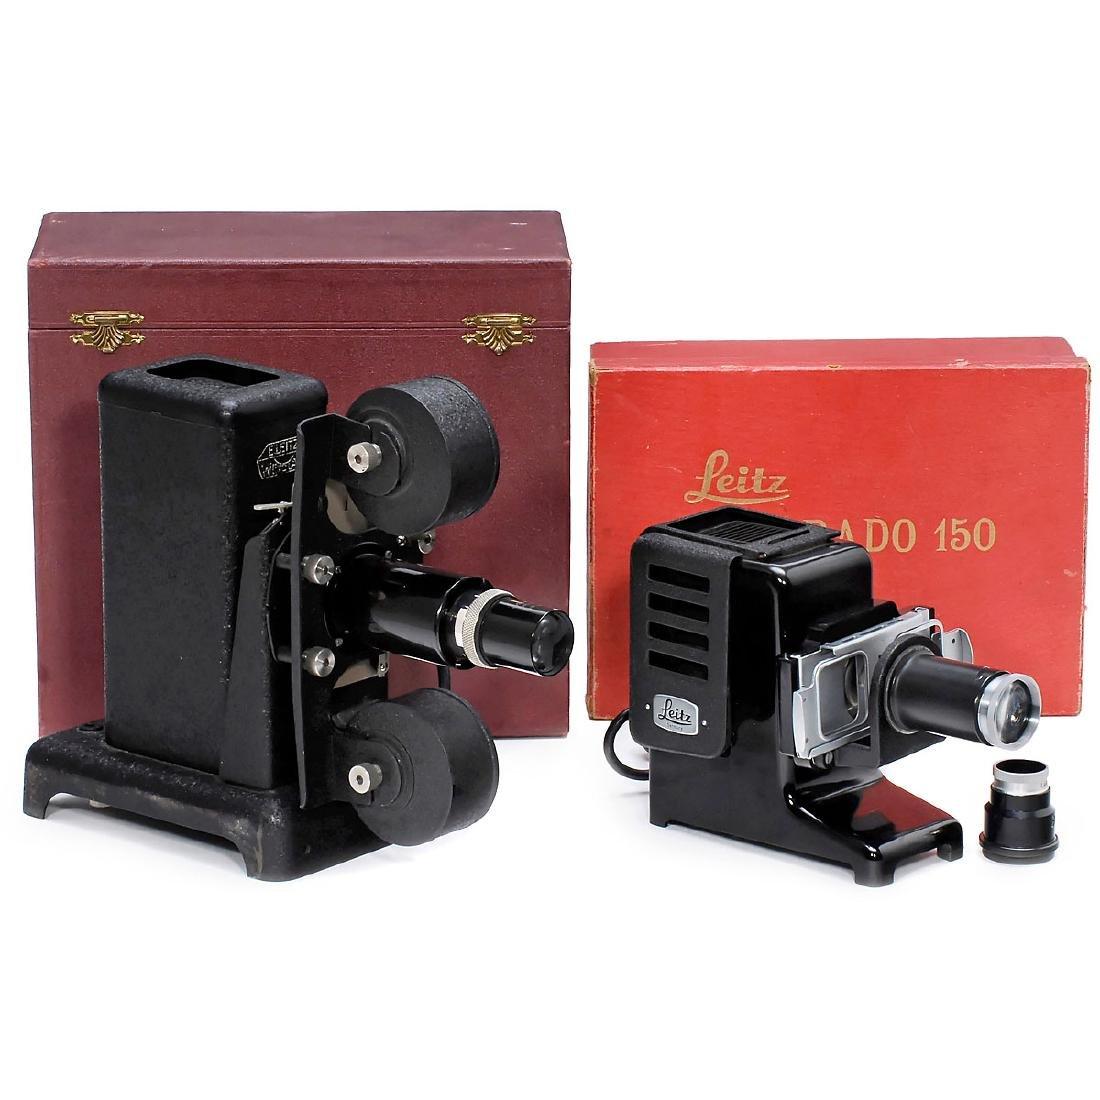 2 Leitz Slide Projectors (VIIIa and Prado 150)